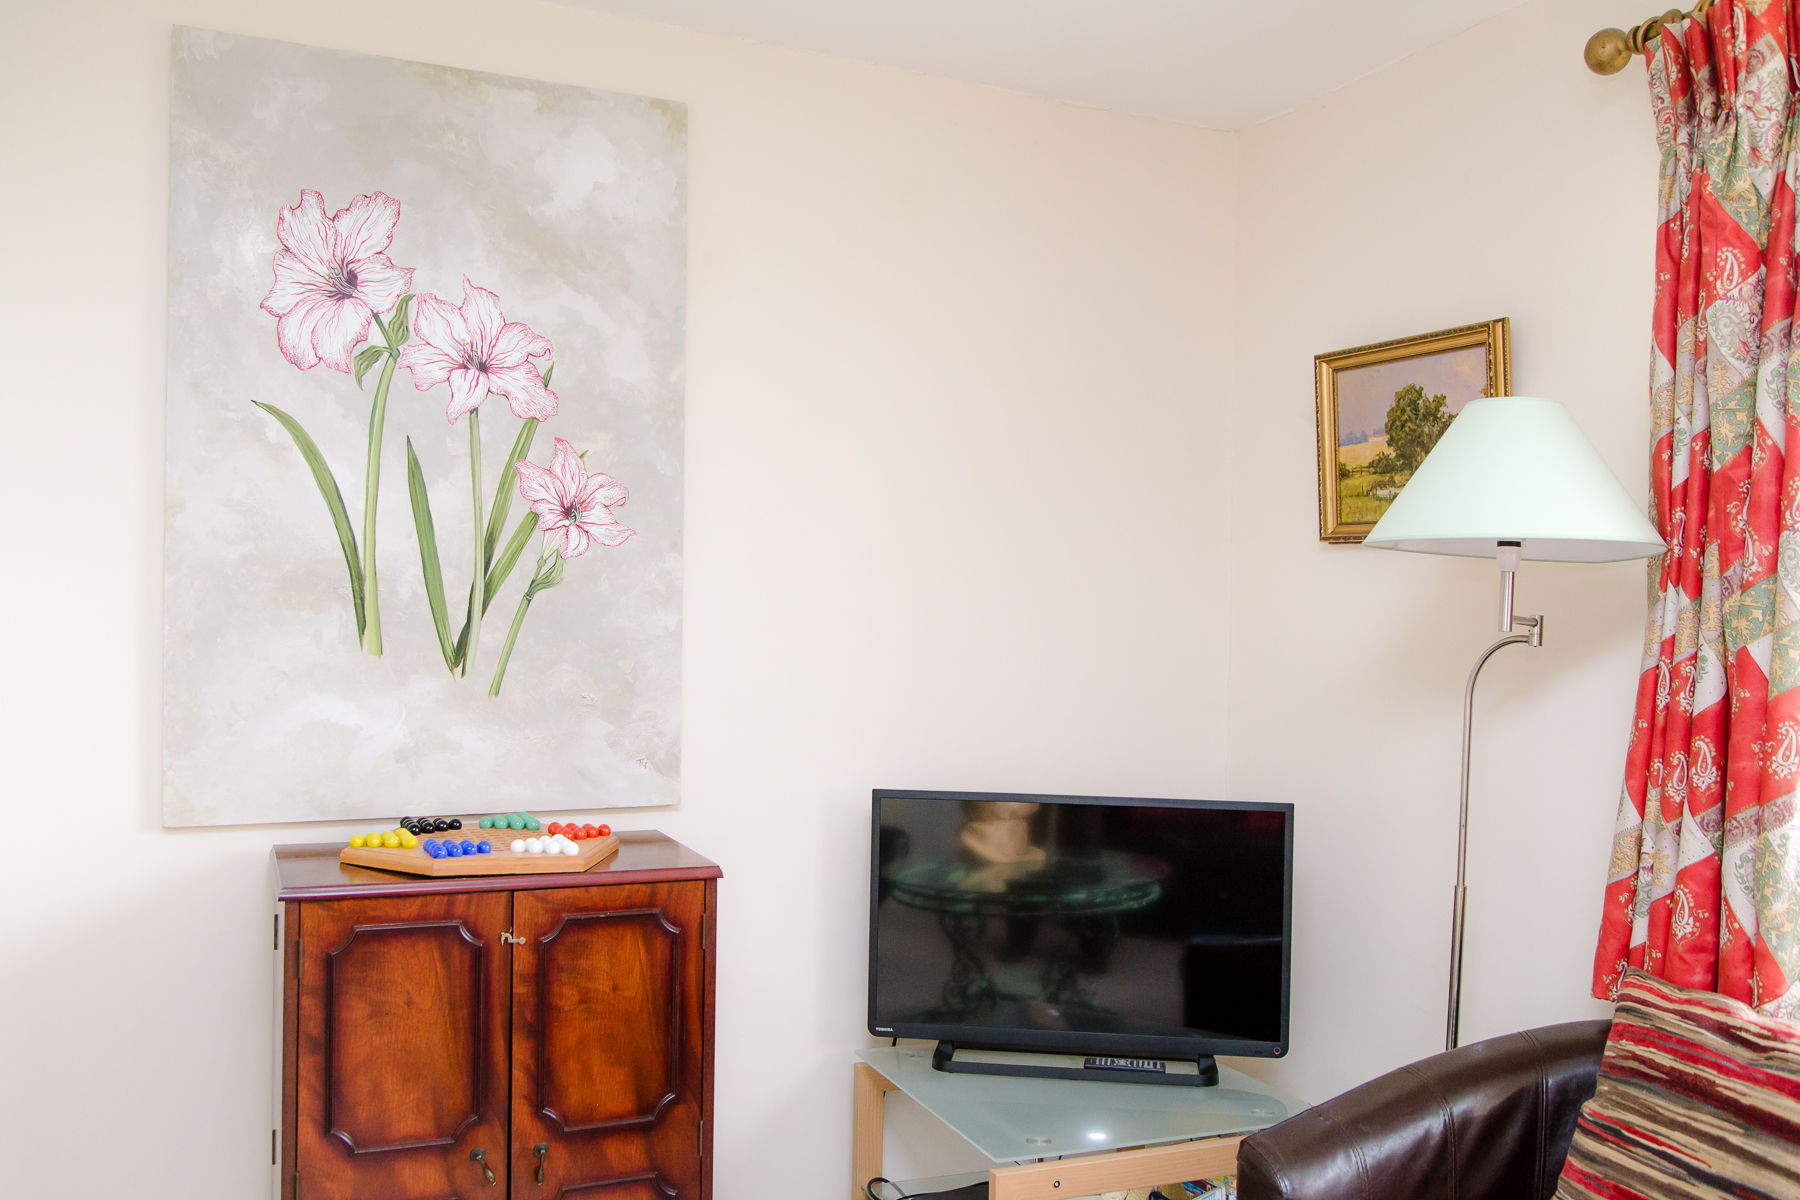 Slait Farm, Gillingham, Dorset, bed and breakfast, guest house, bed & breakfast,